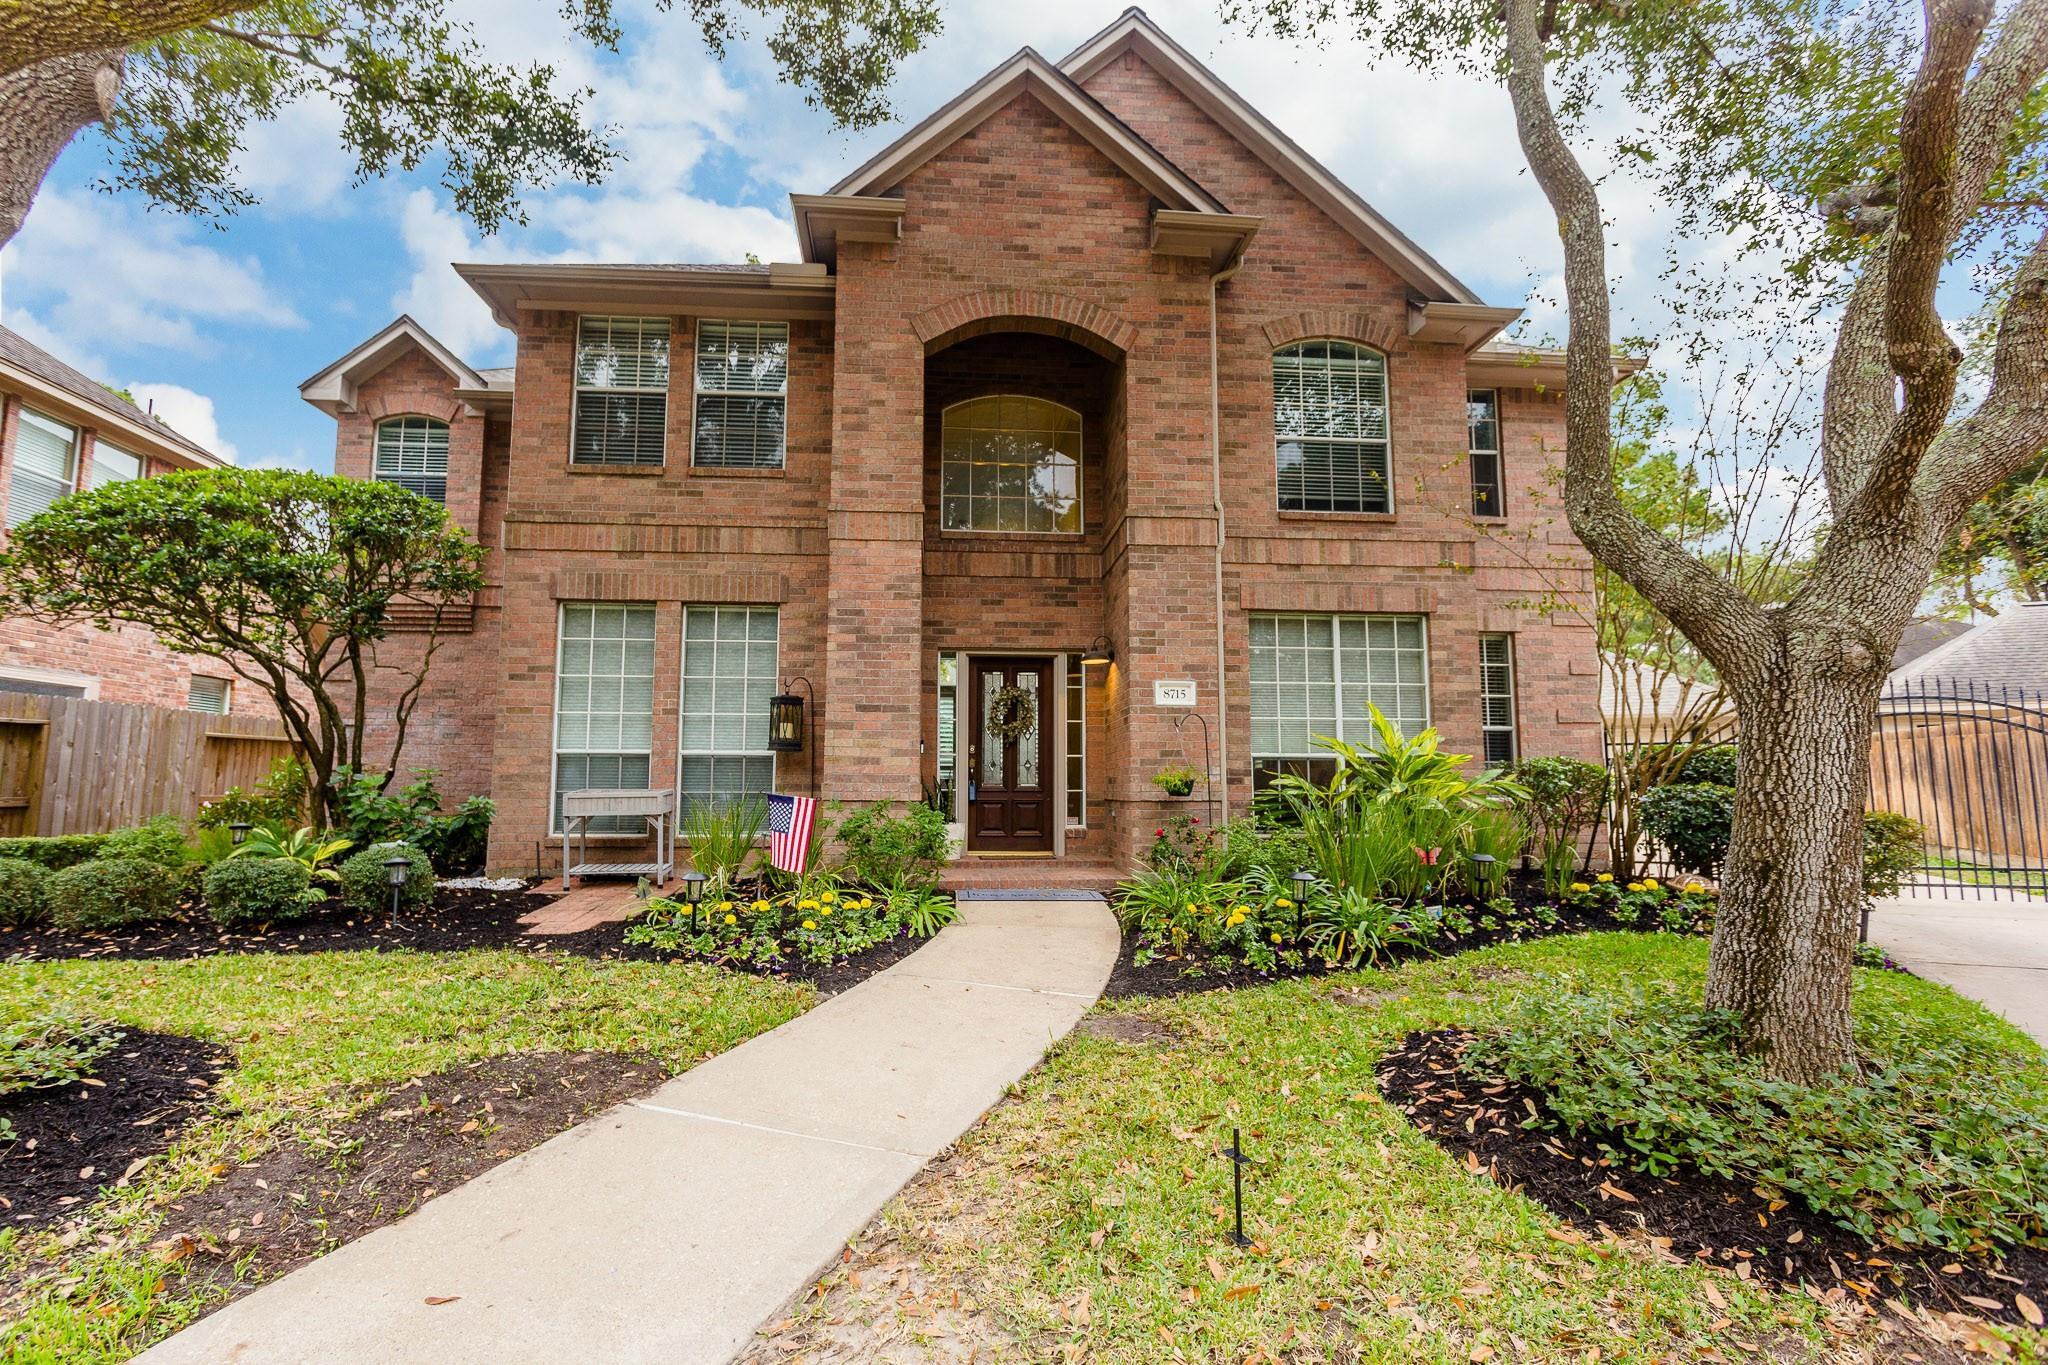 8715 Golden Chord Circle Property Photo - Houston, TX real estate listing